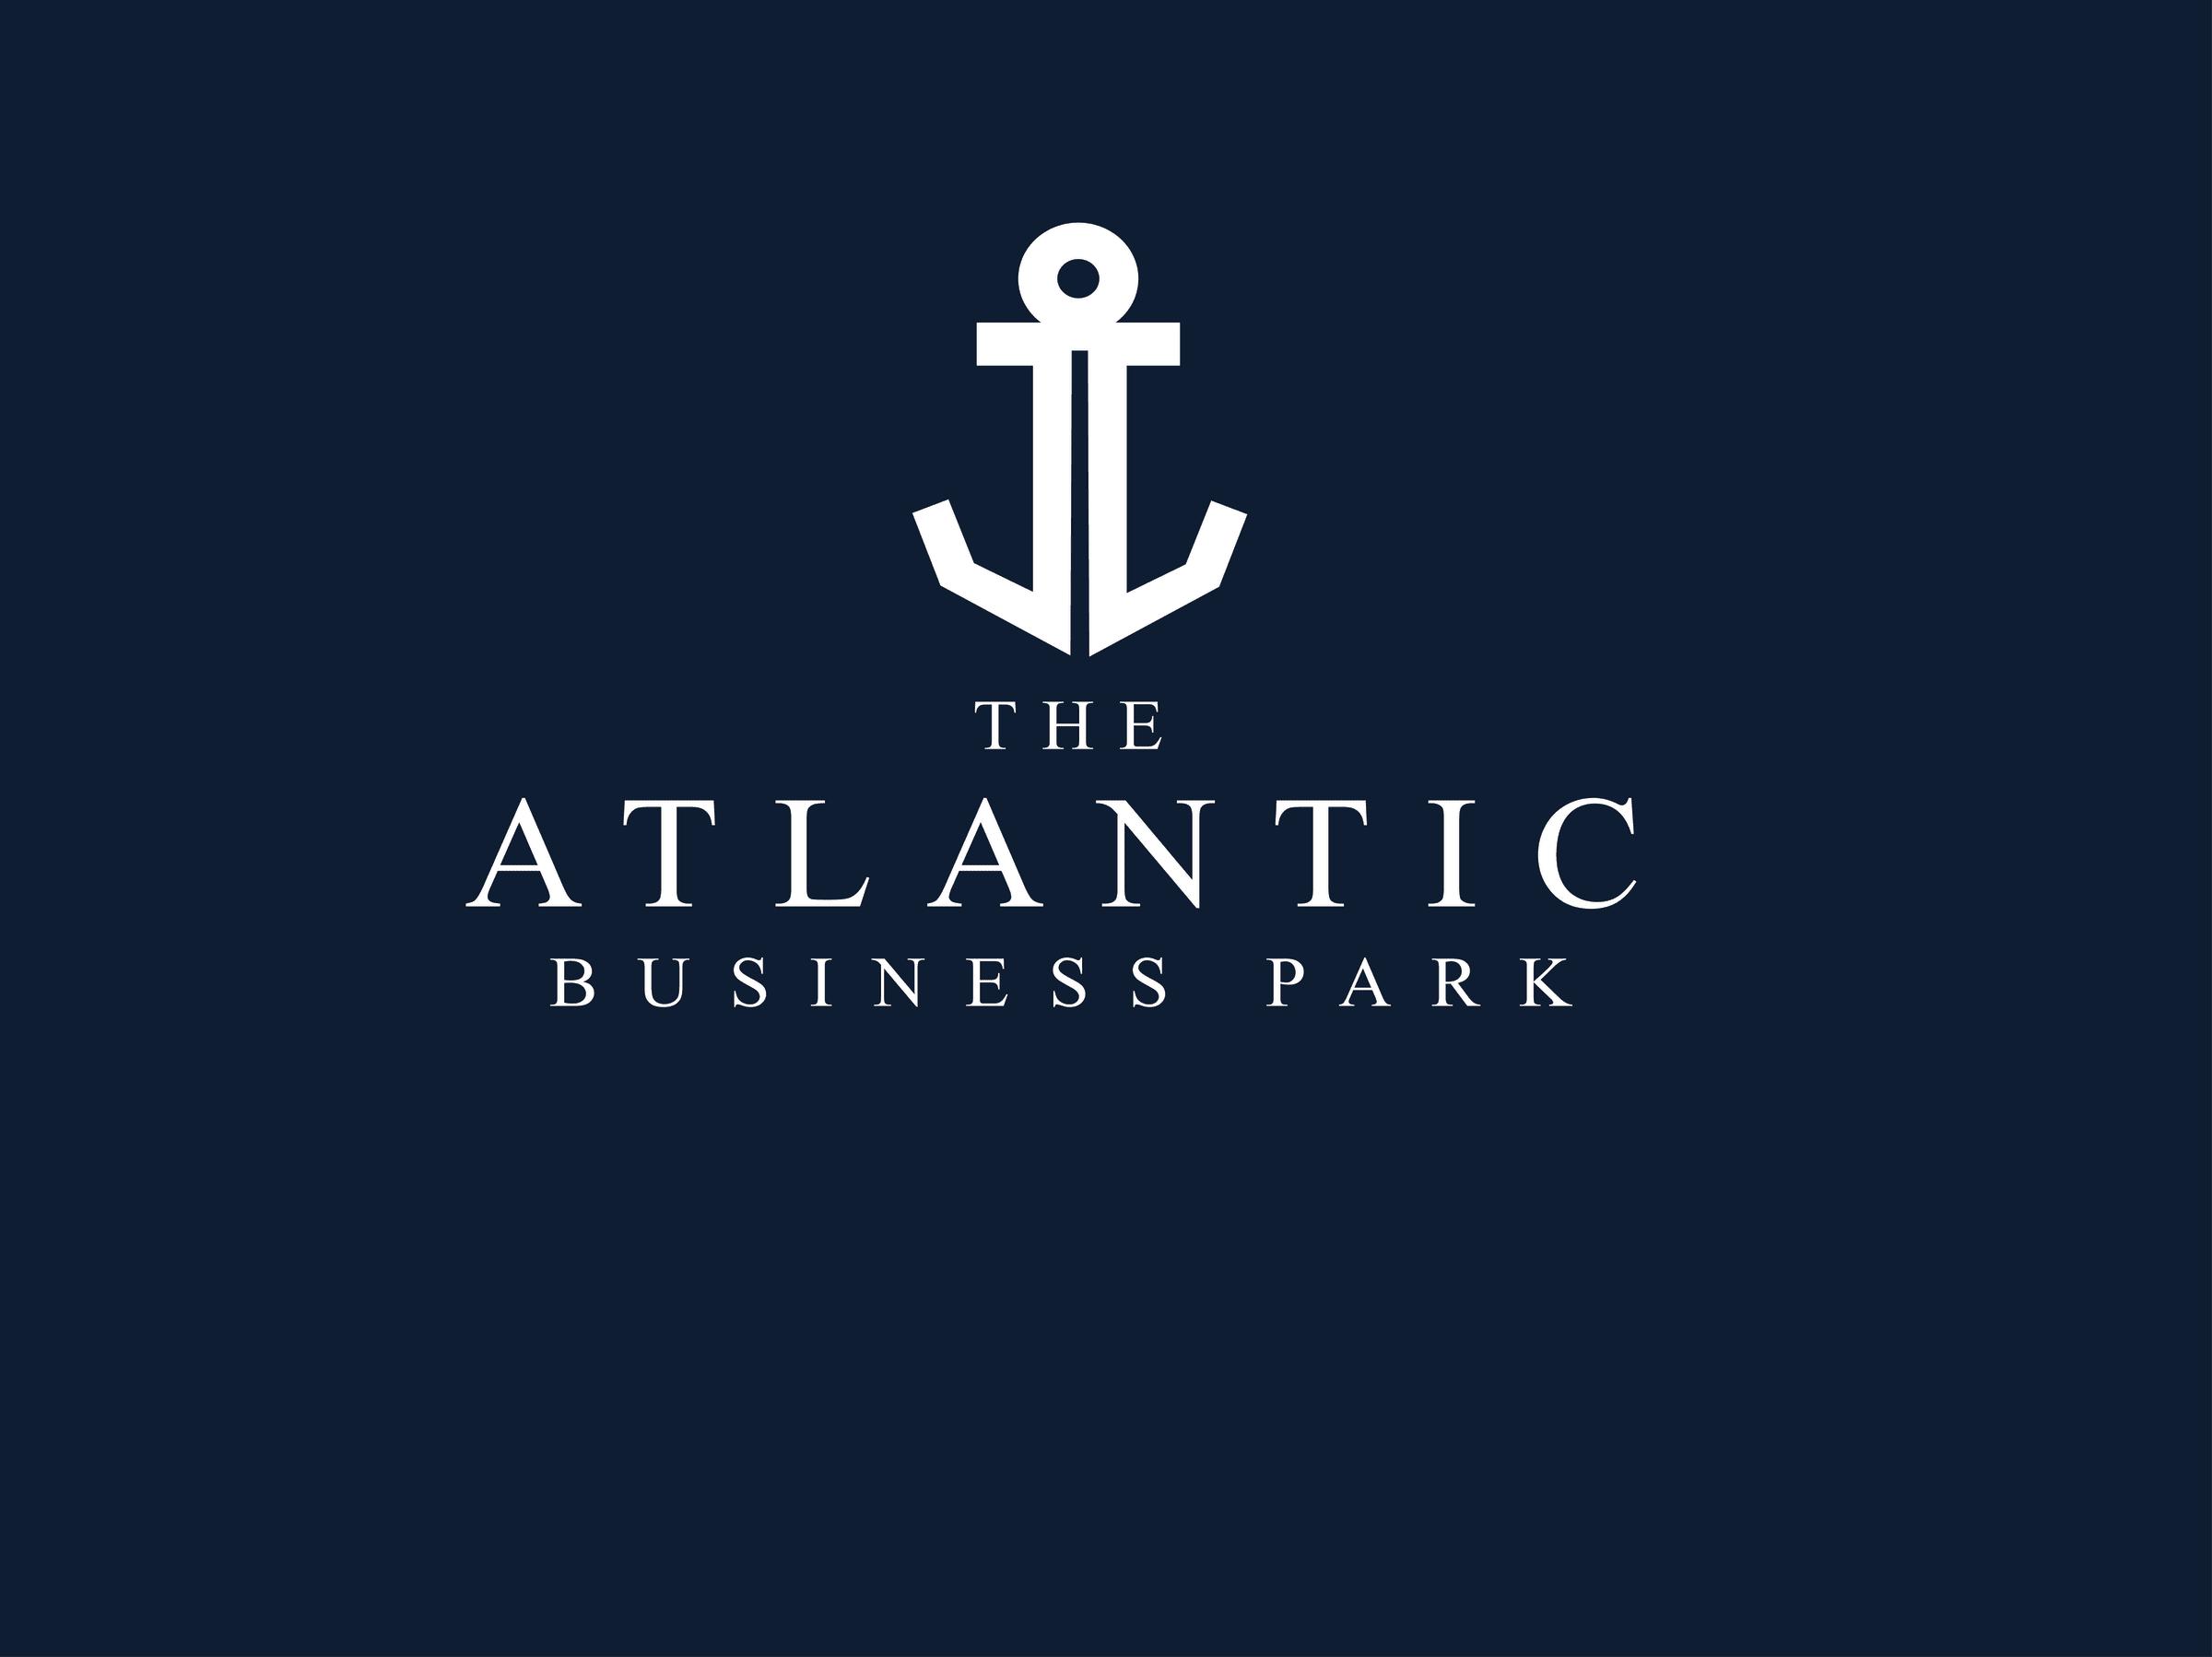 The Atlantic Business Park - Logo designed by CGI Lab